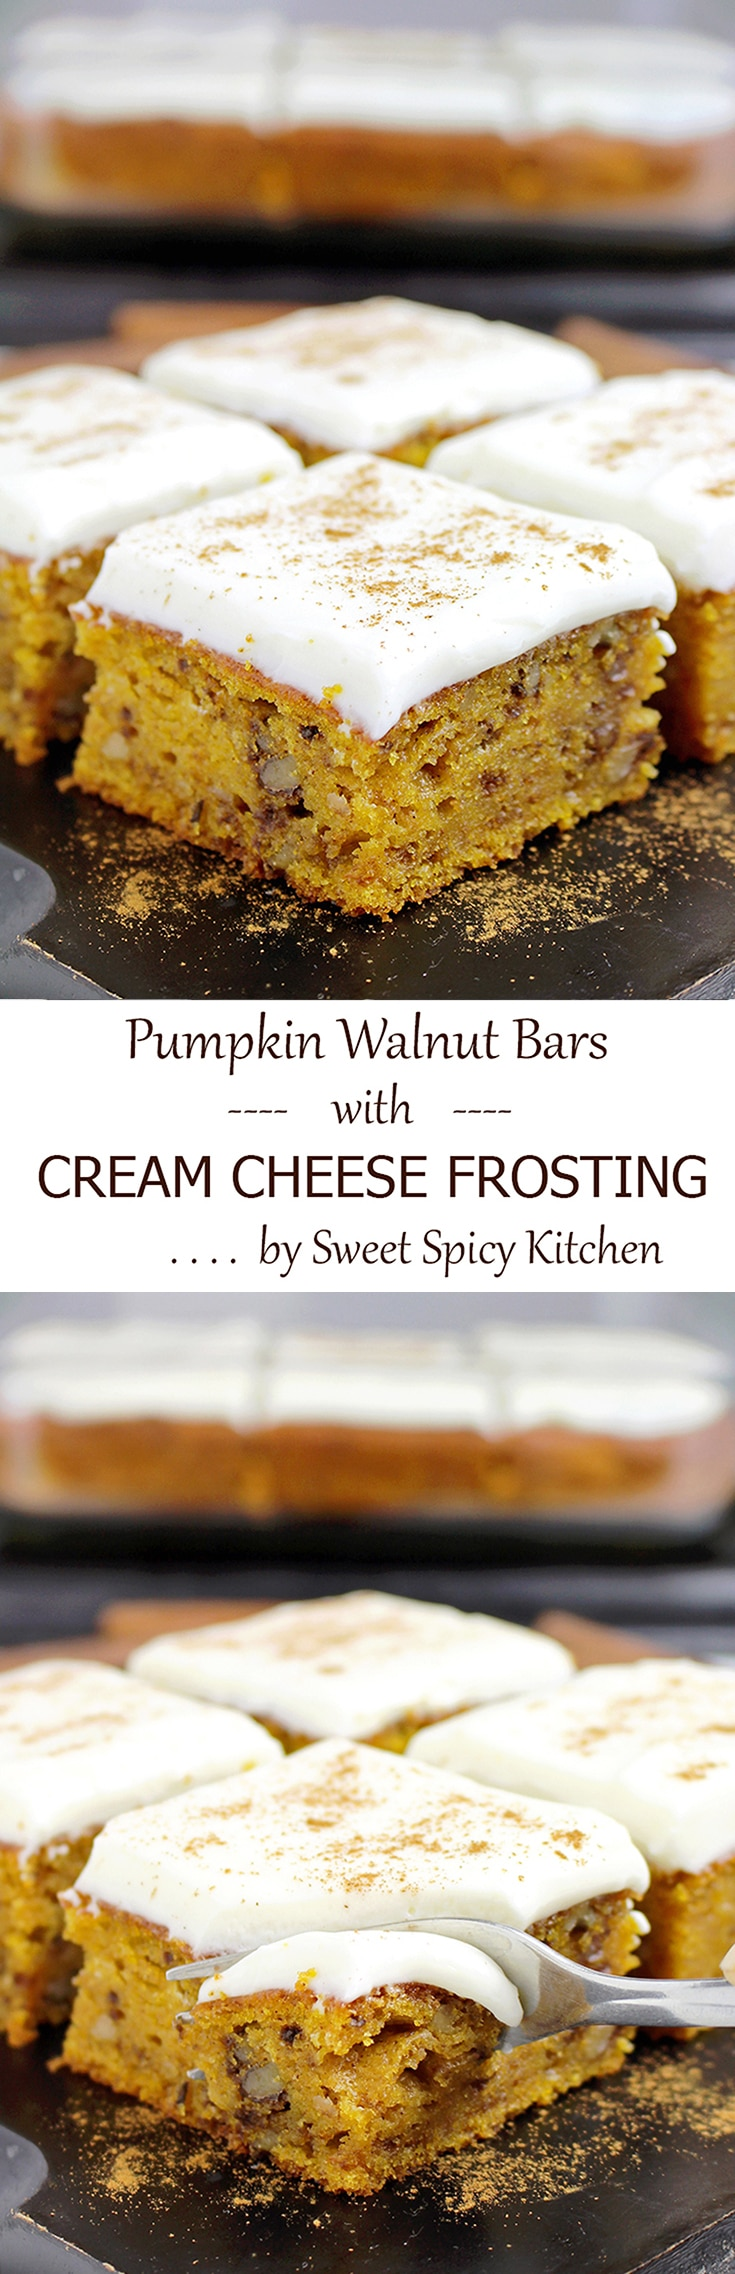 Pumpkin Walnut Cake With Cream Cheese Frosting